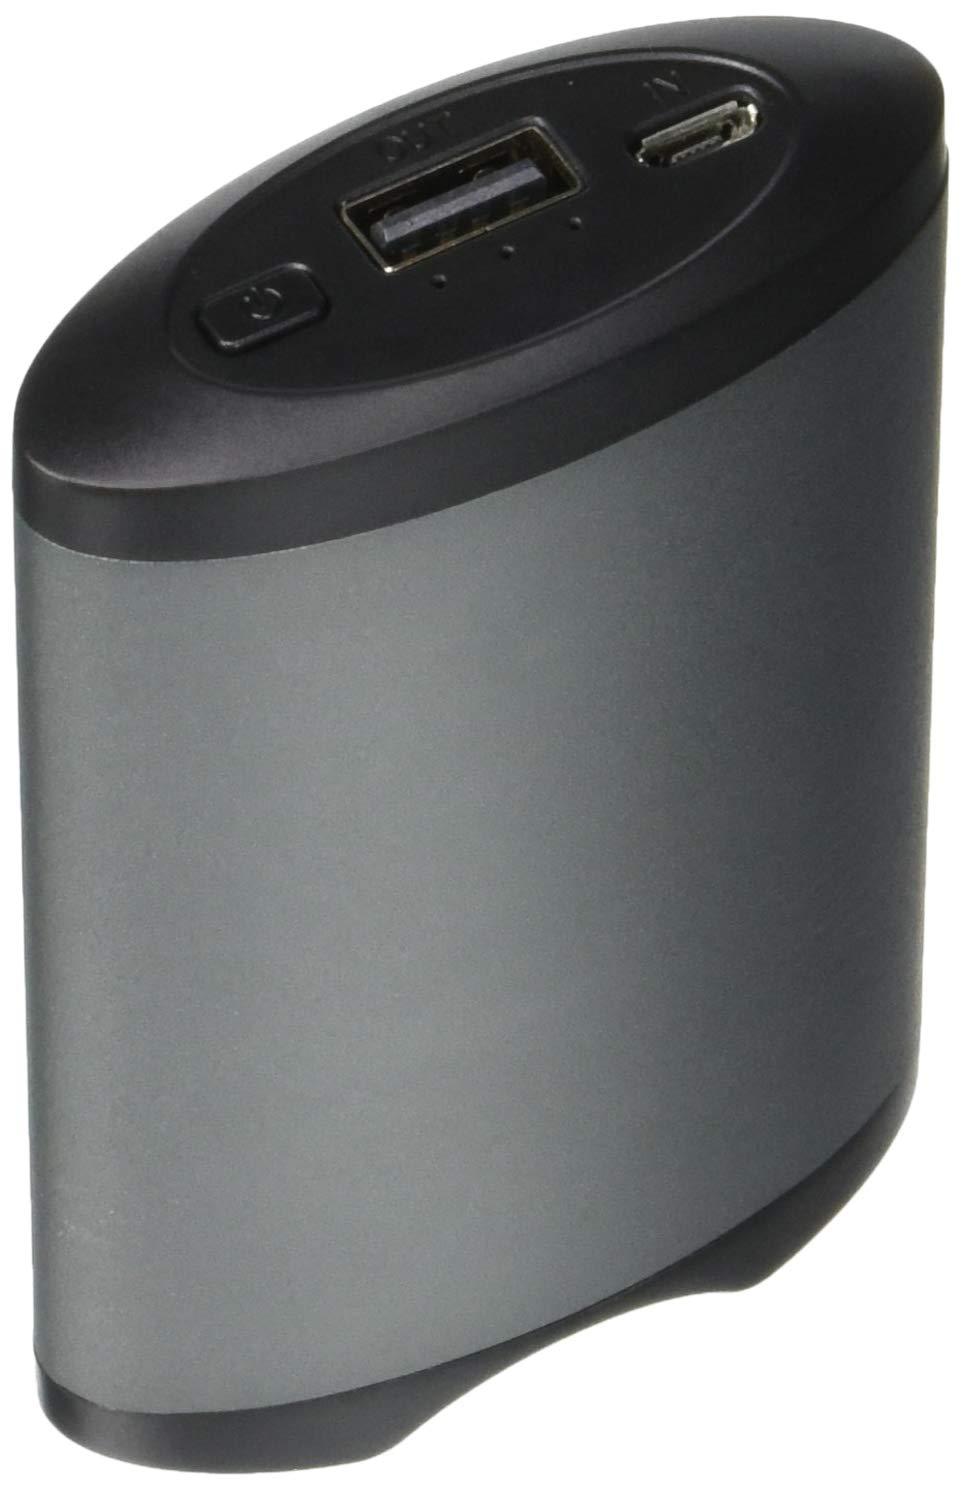 Lucy CL050-VG Polypropylene Swing Top Bin 50 L Capacity Verdigris